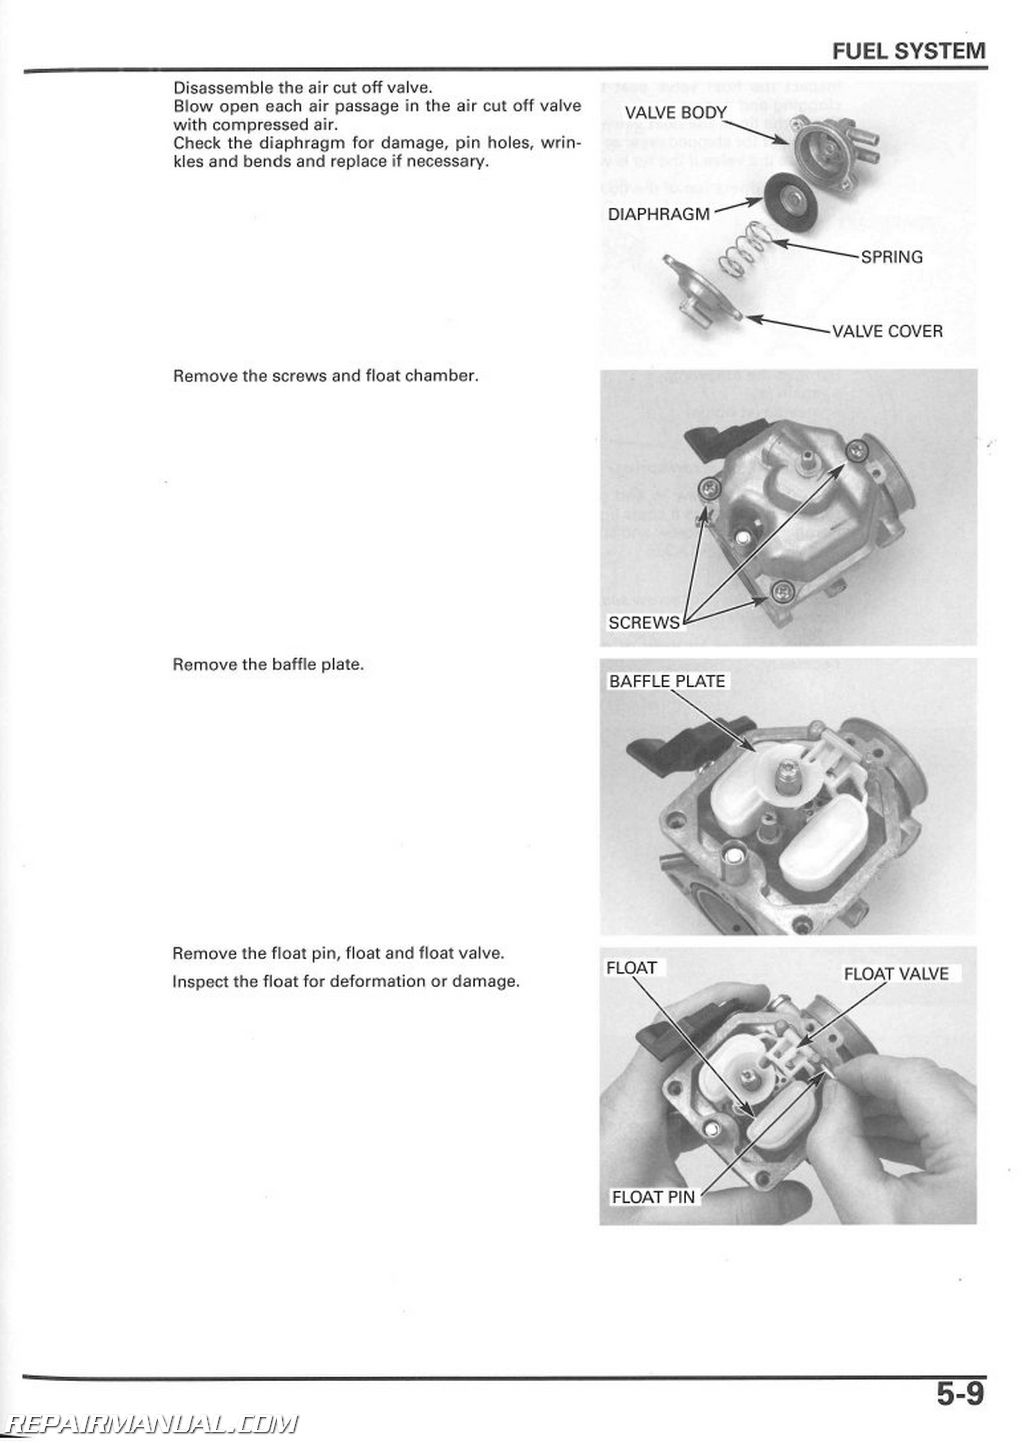 hight resolution of honda 4 track 1996 atv wiring schematic